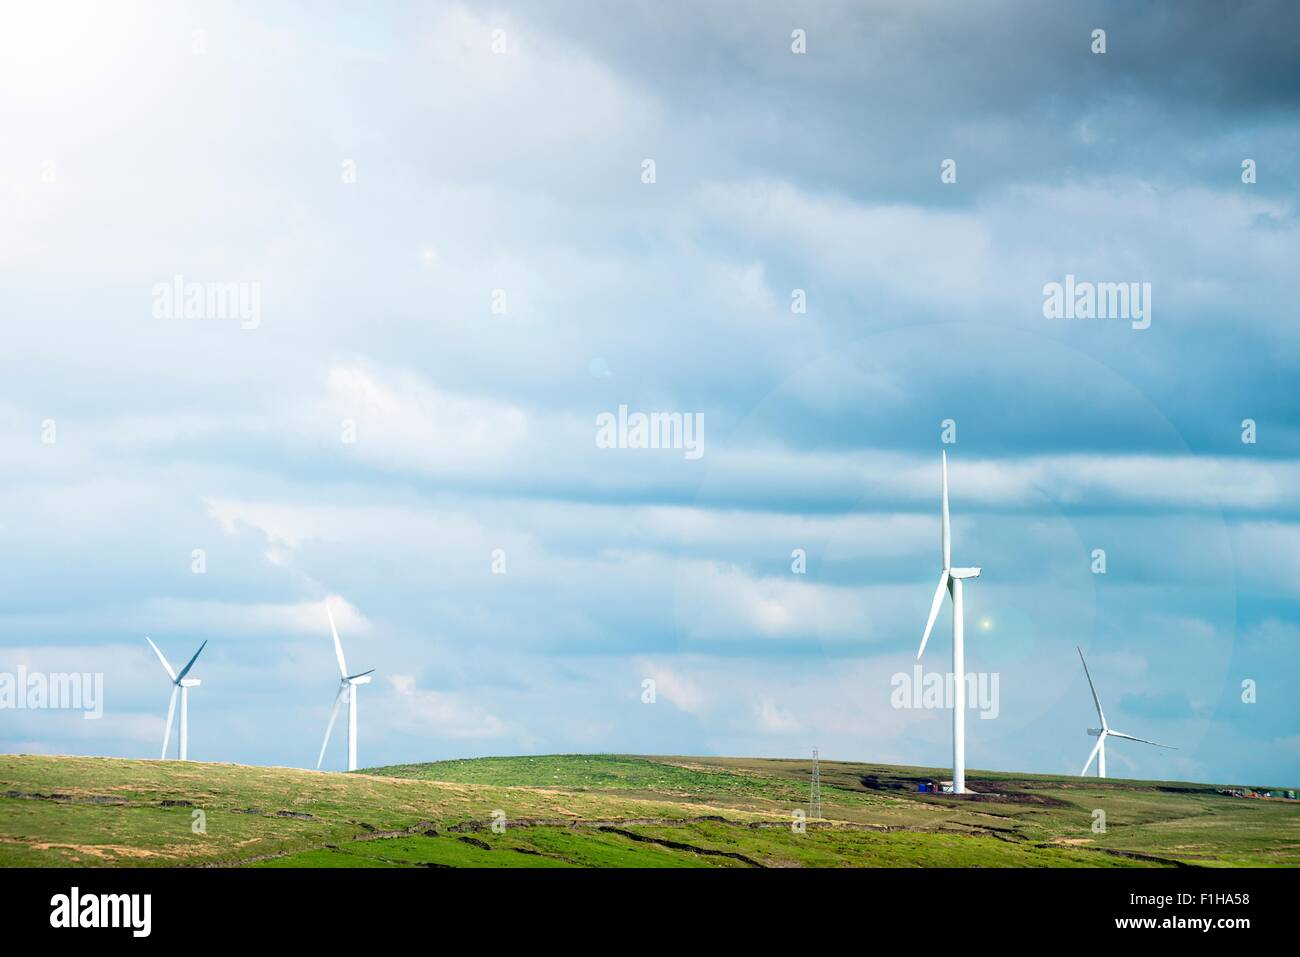 View of wind turbines on moorland, UK - Stock Image